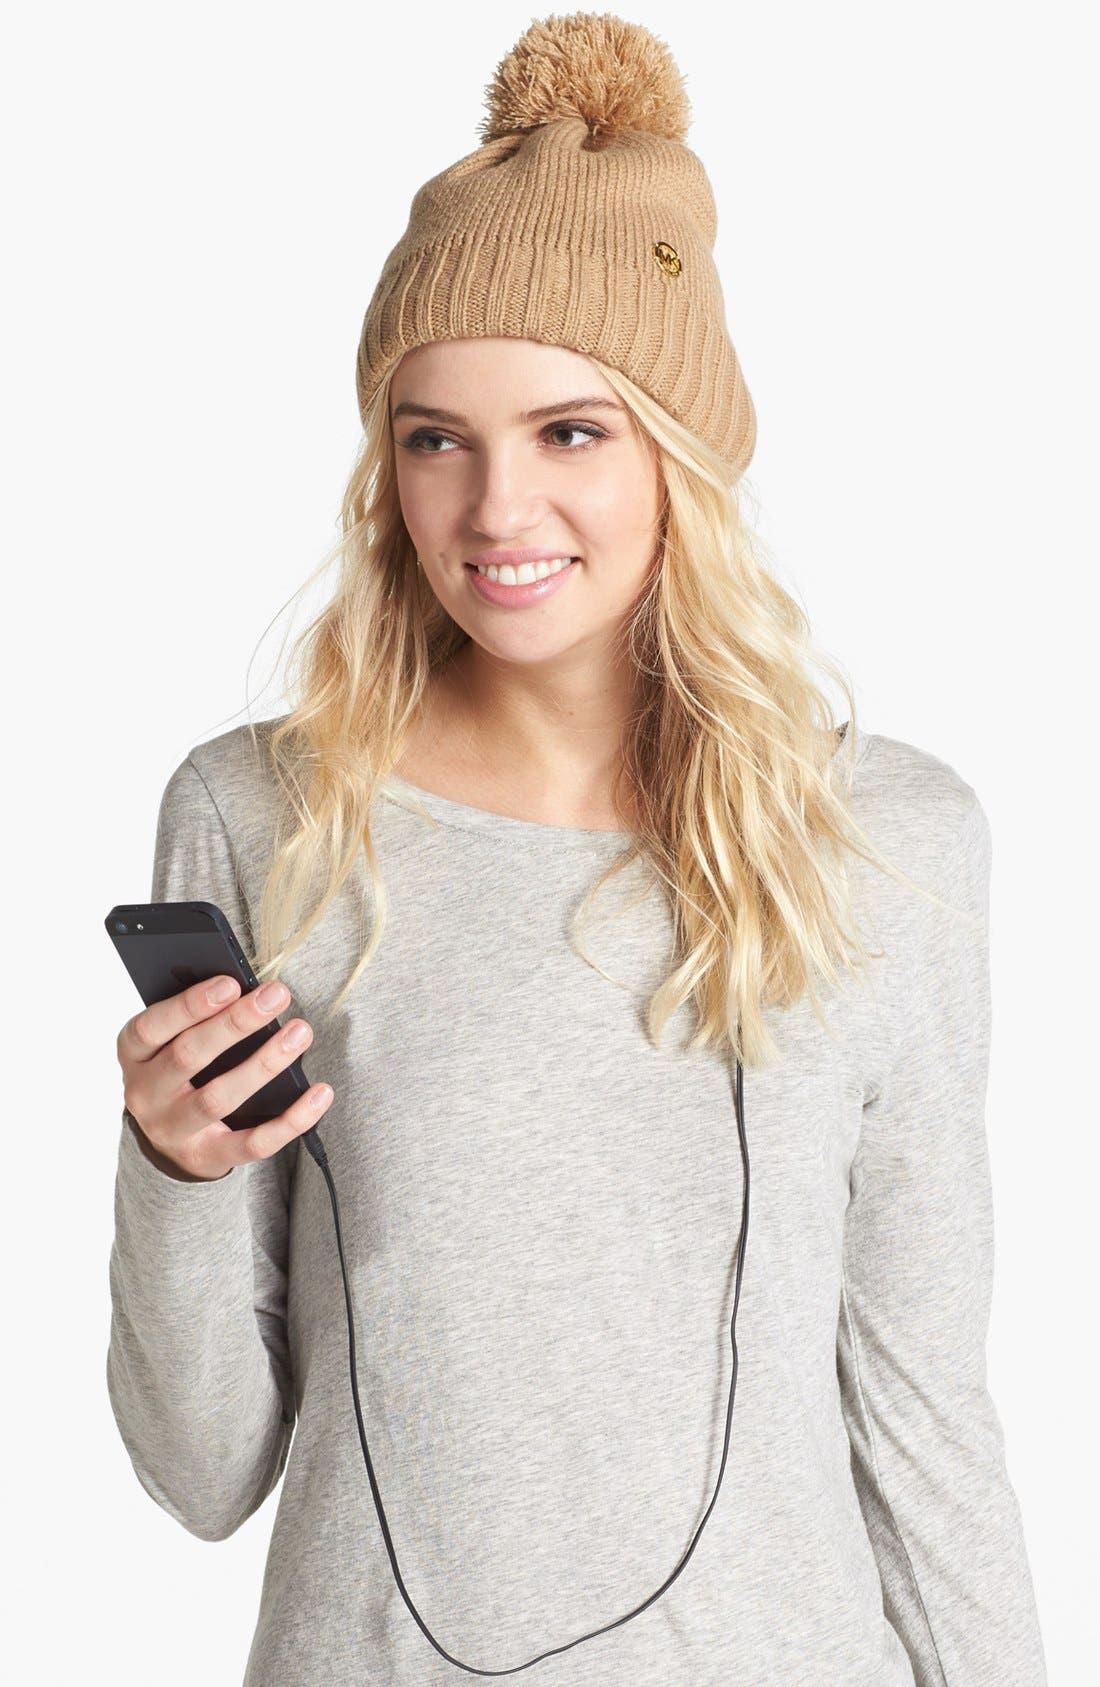 Alternate Image 1 Selected - MICHAEL Michael Kors 'Tech' Knit Hat